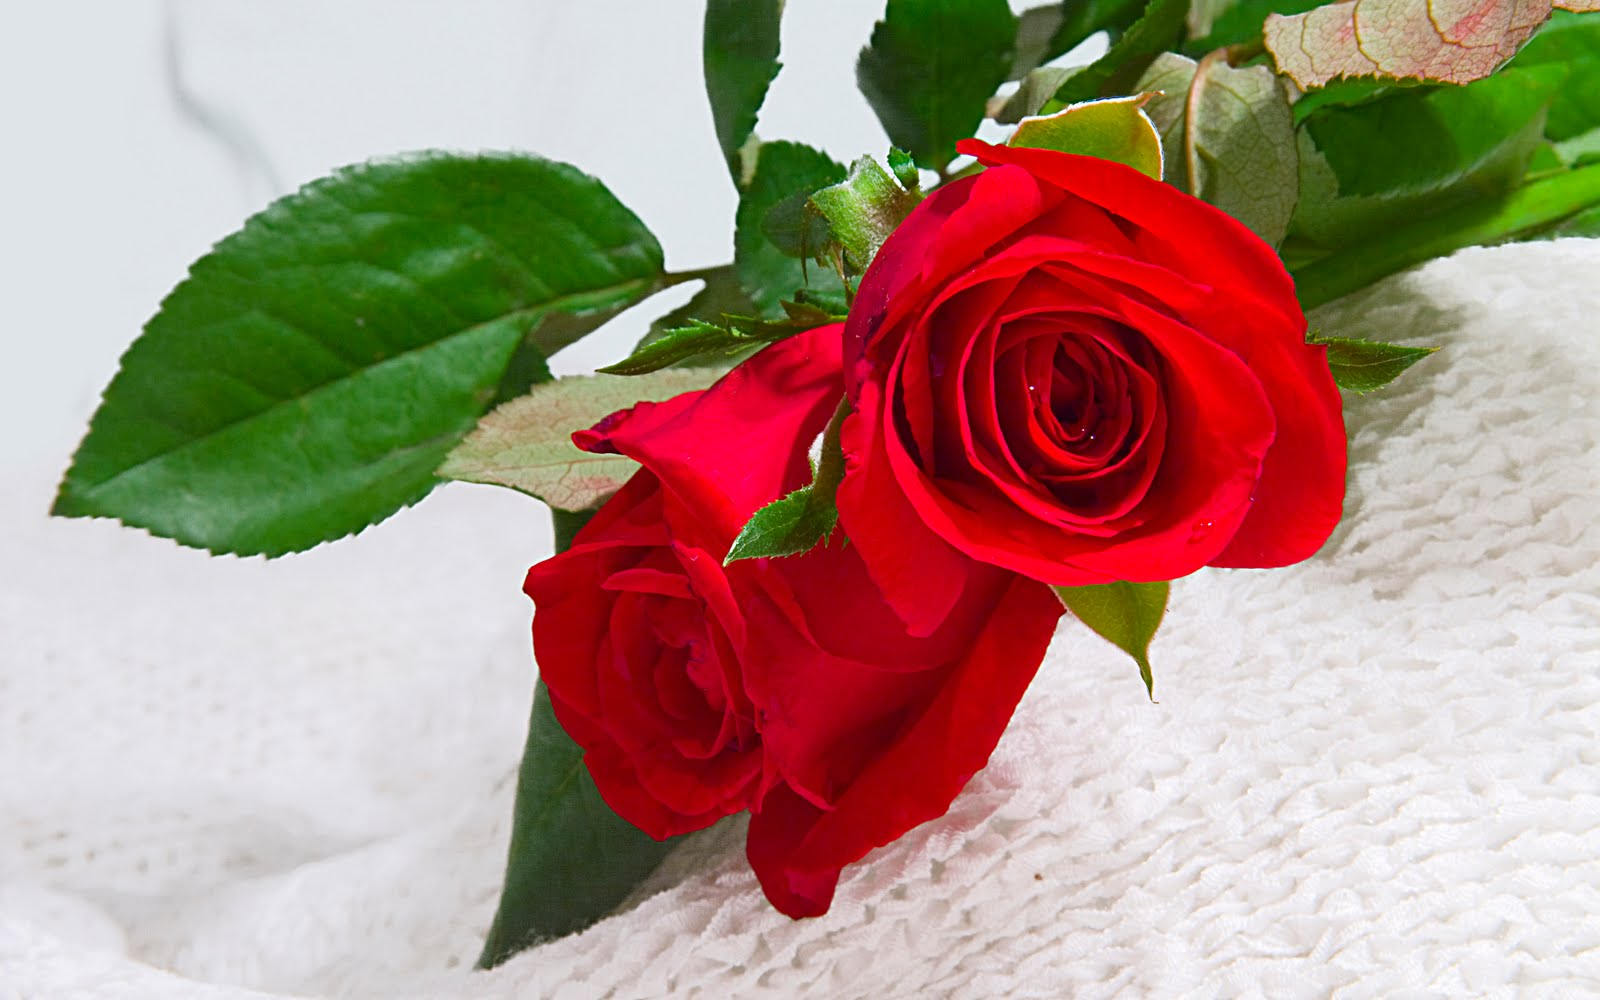 rose flowers 7065